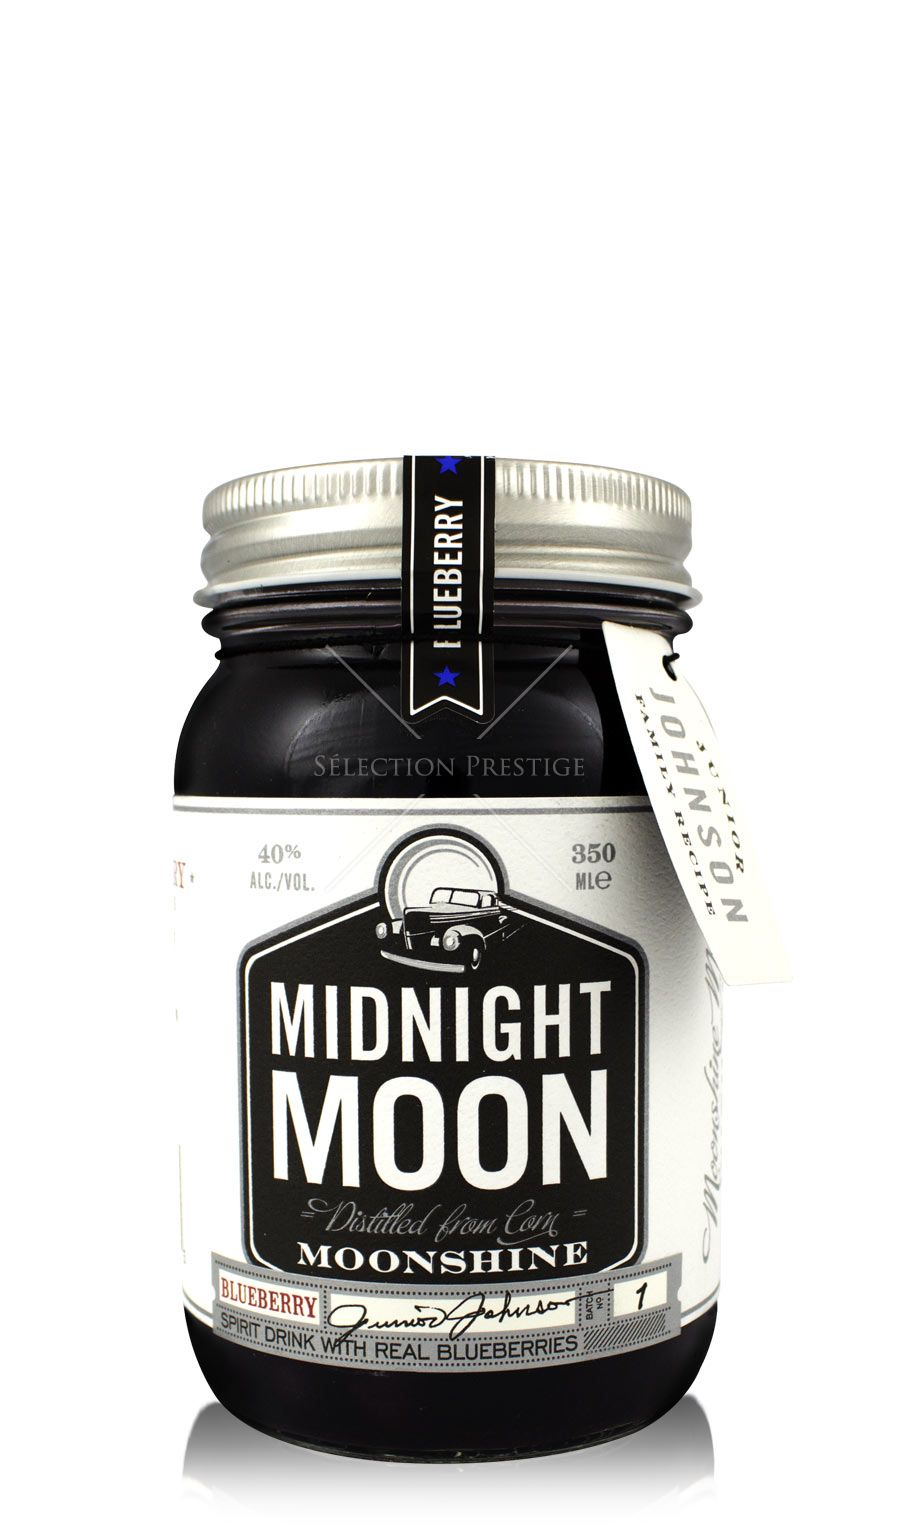 midnight moonshine drinks - photo #1